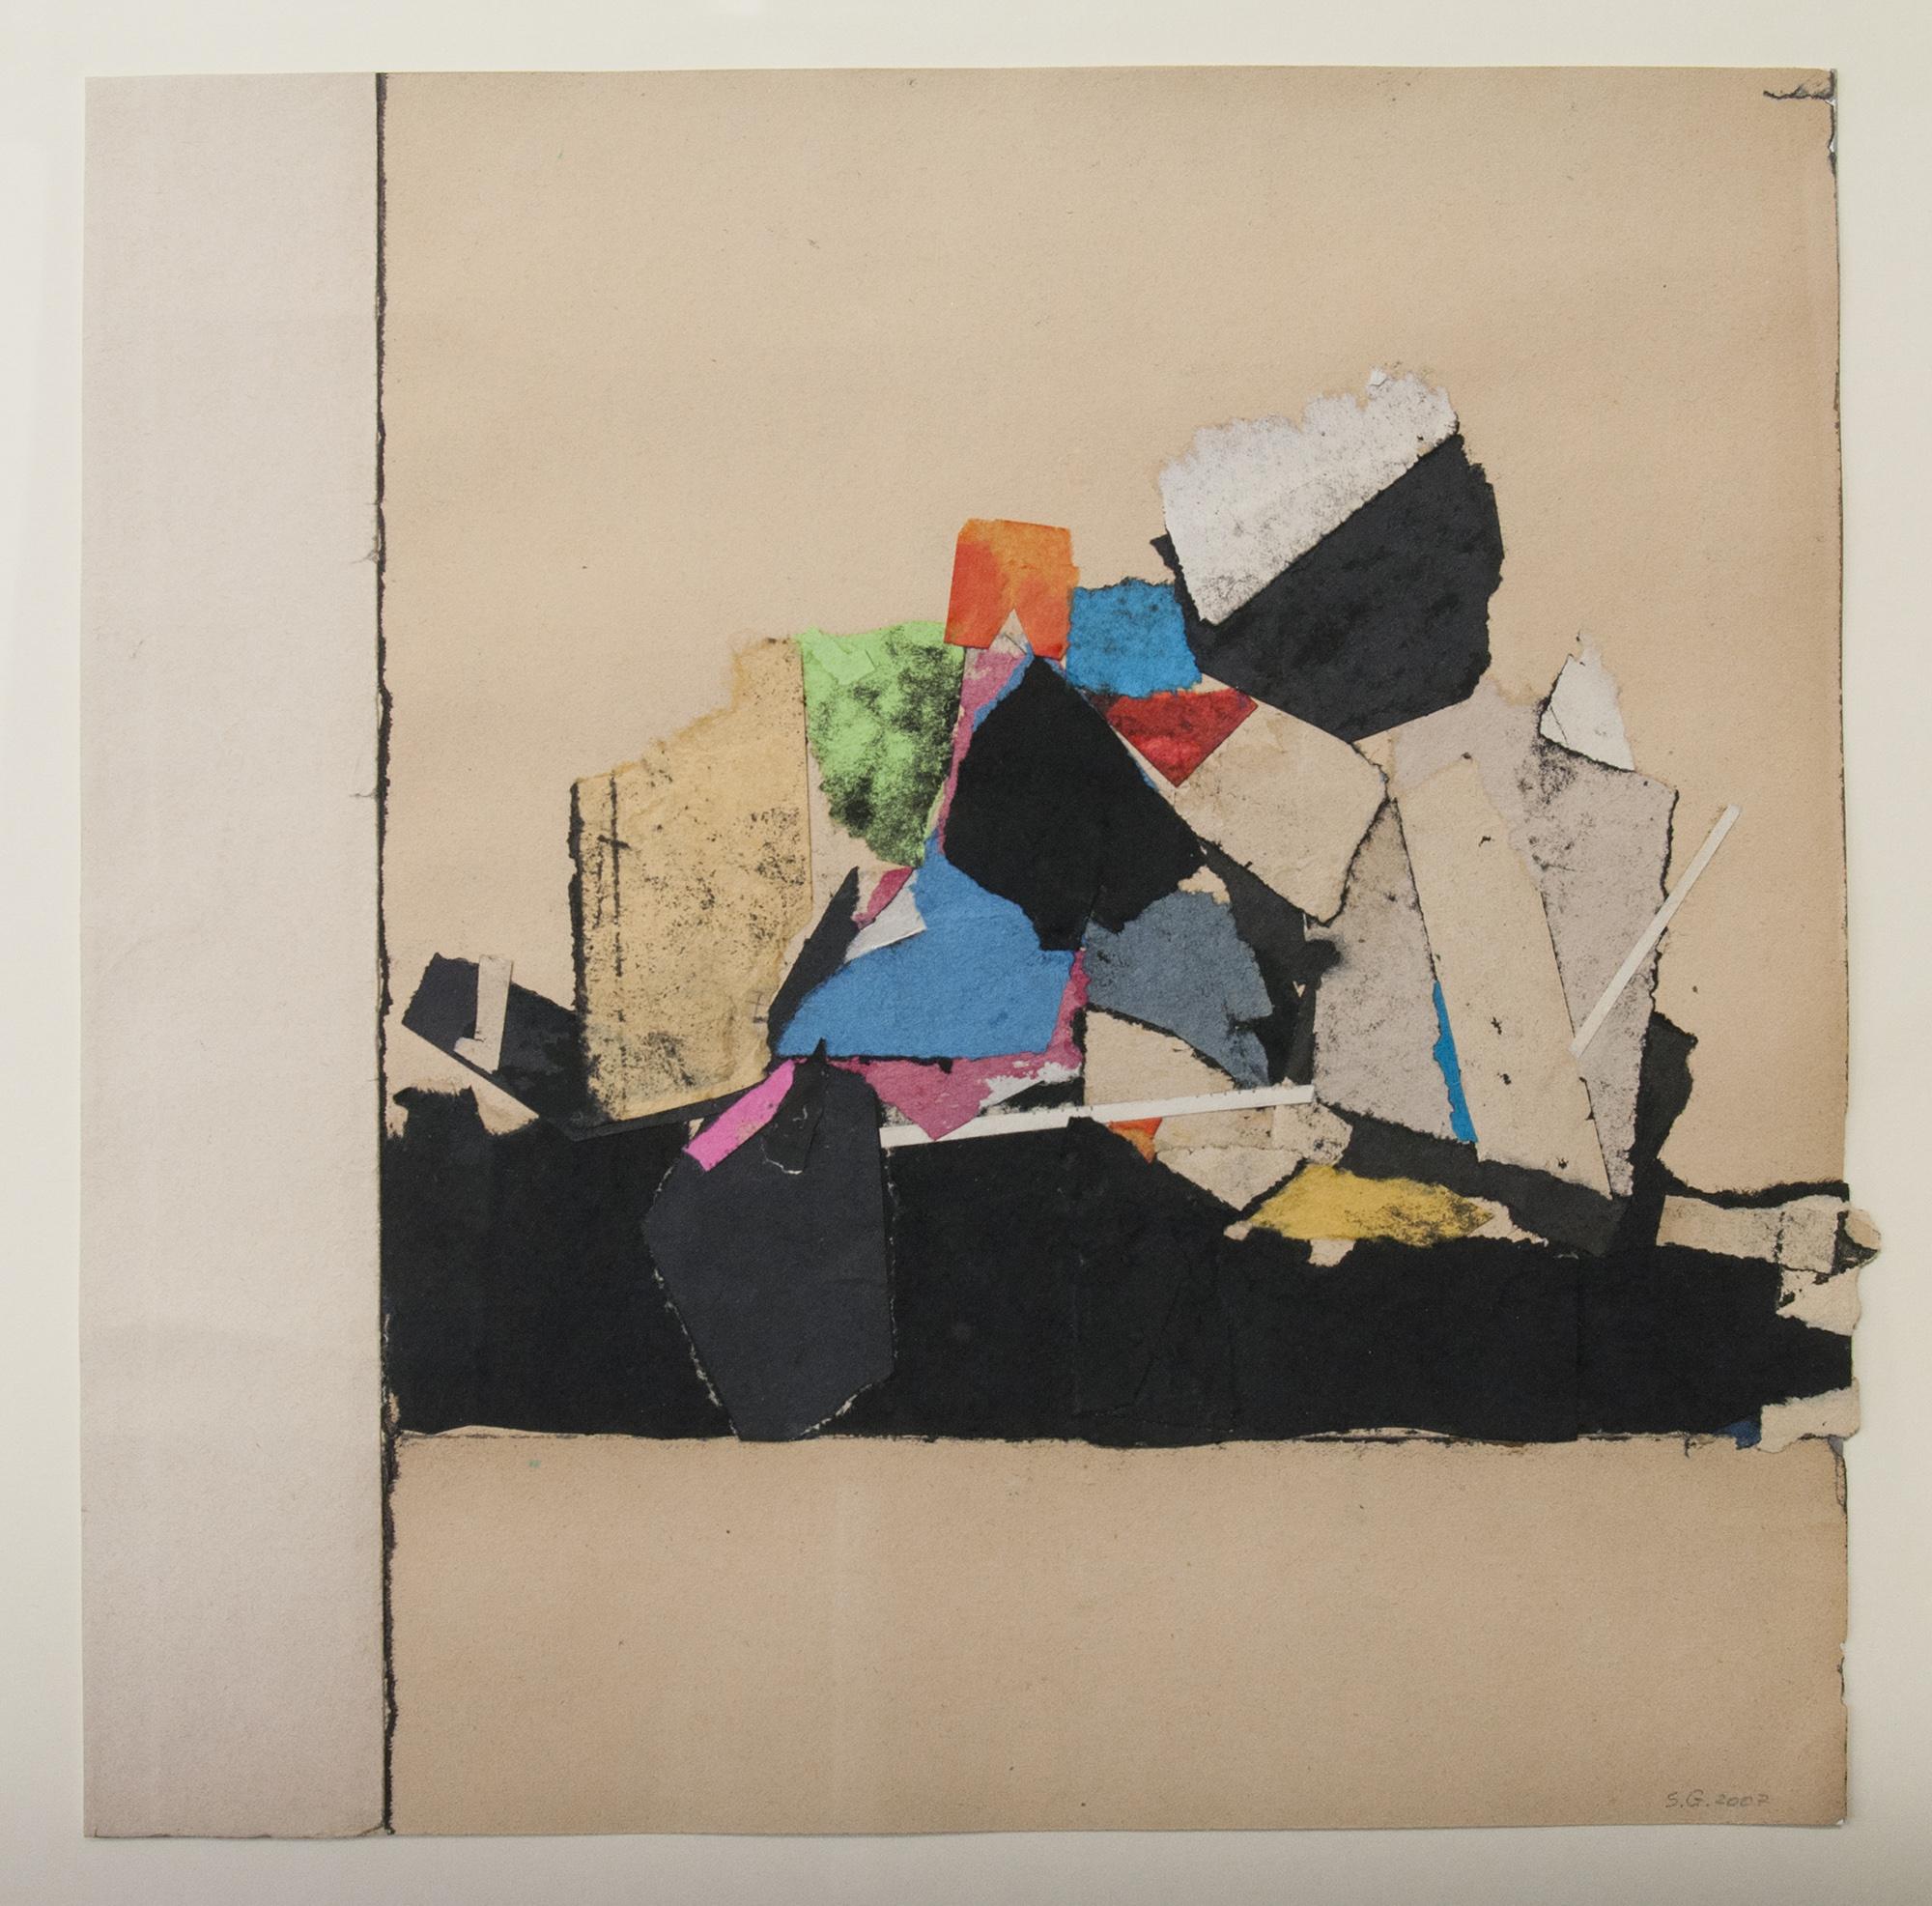 Sam Grigorian, Untitled , 2007, mixed media, decollage, paper, 30.5 x 30.5cm